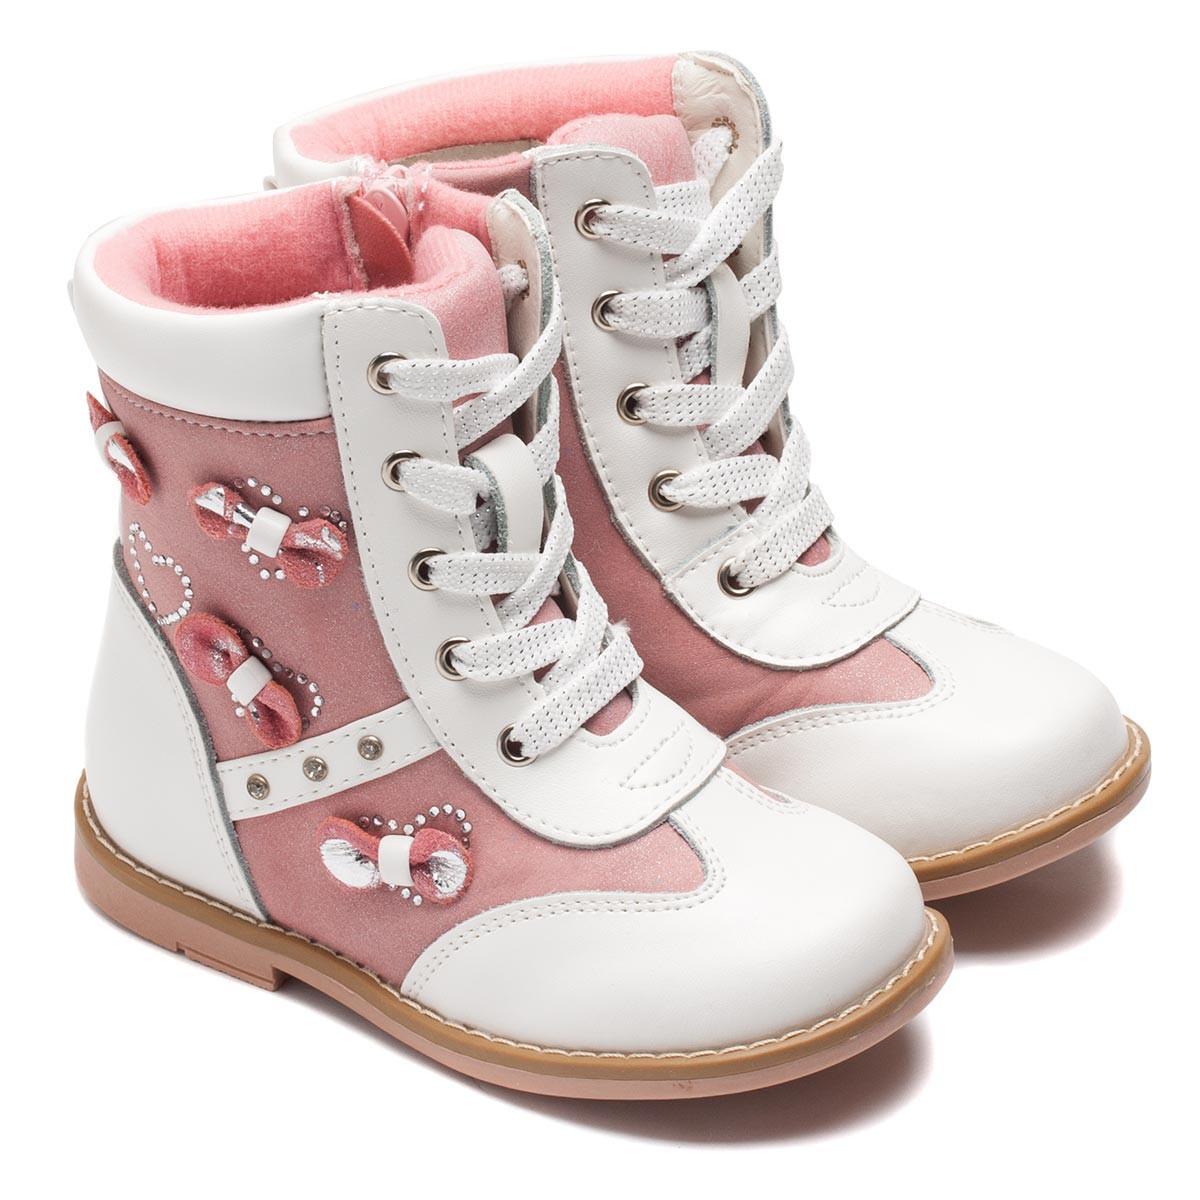 309b20061 Ботинки Шалунишка - Ортопед на девочку, белые, размер 24-29 ...